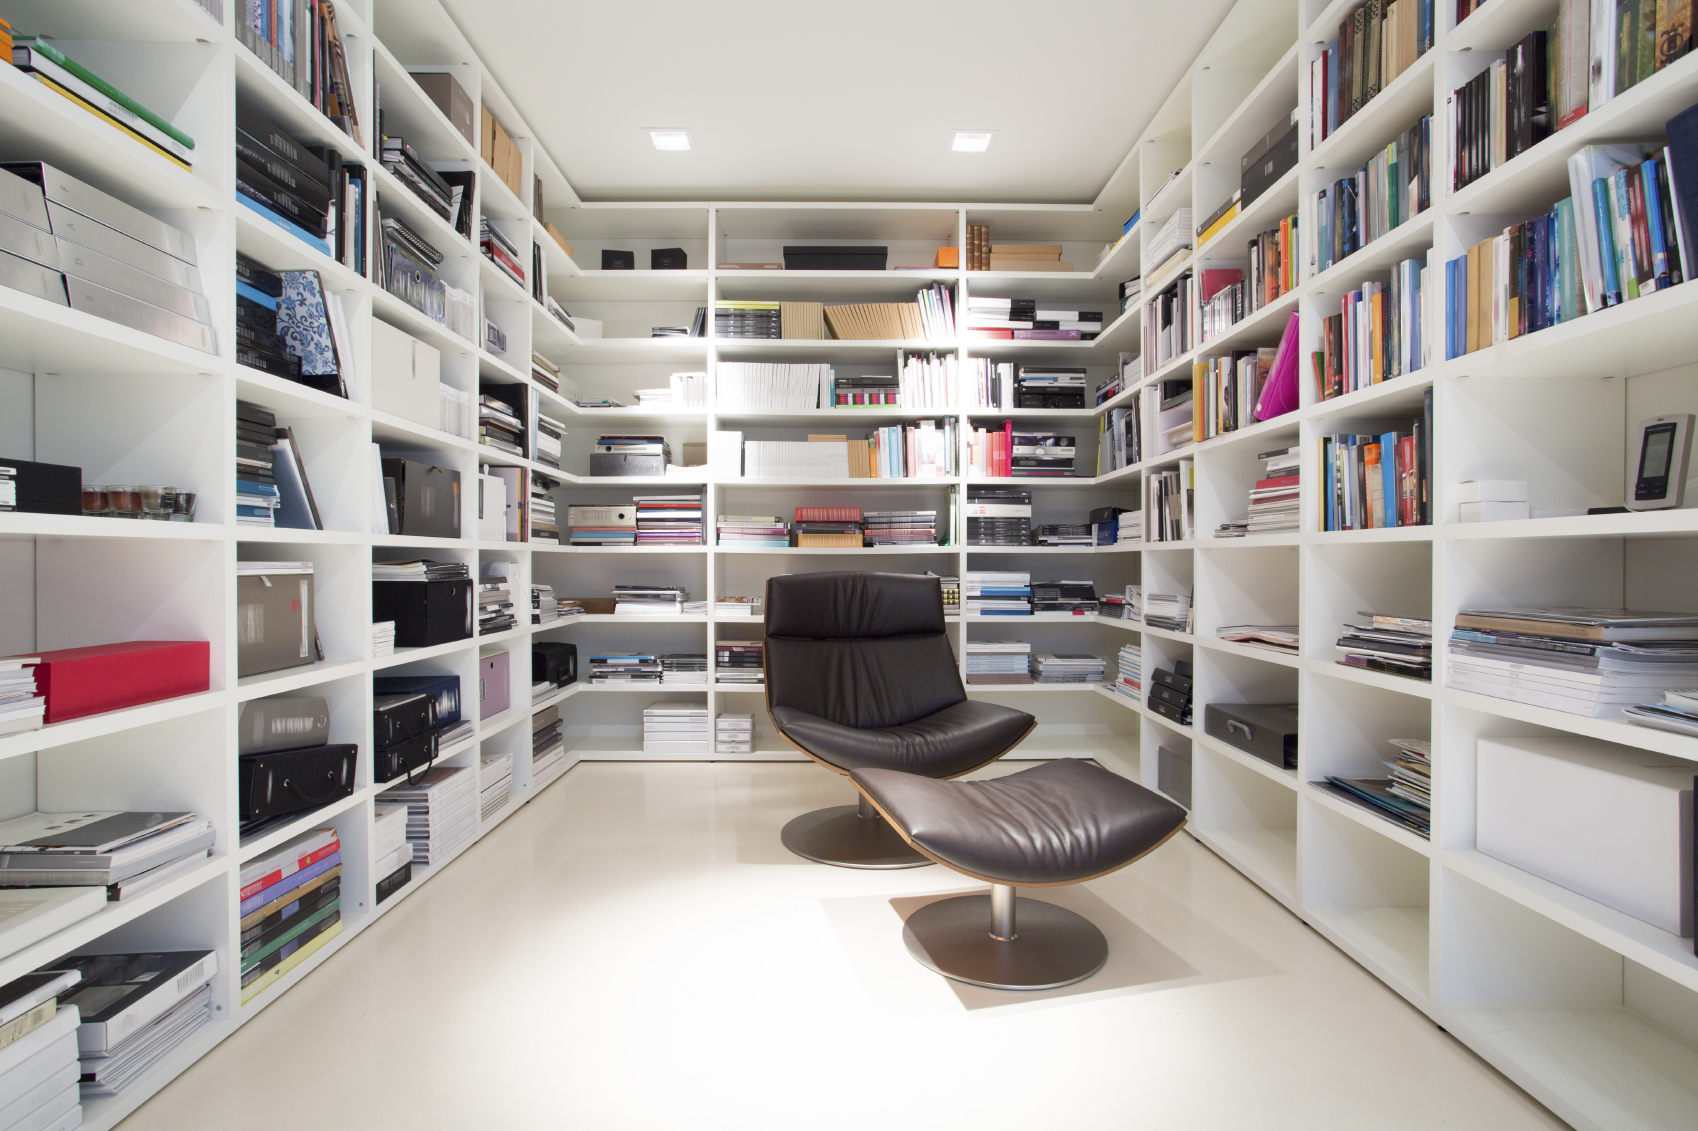 C mo crear una biblioteca moderna en tu hogar univision for Home library designs interior design